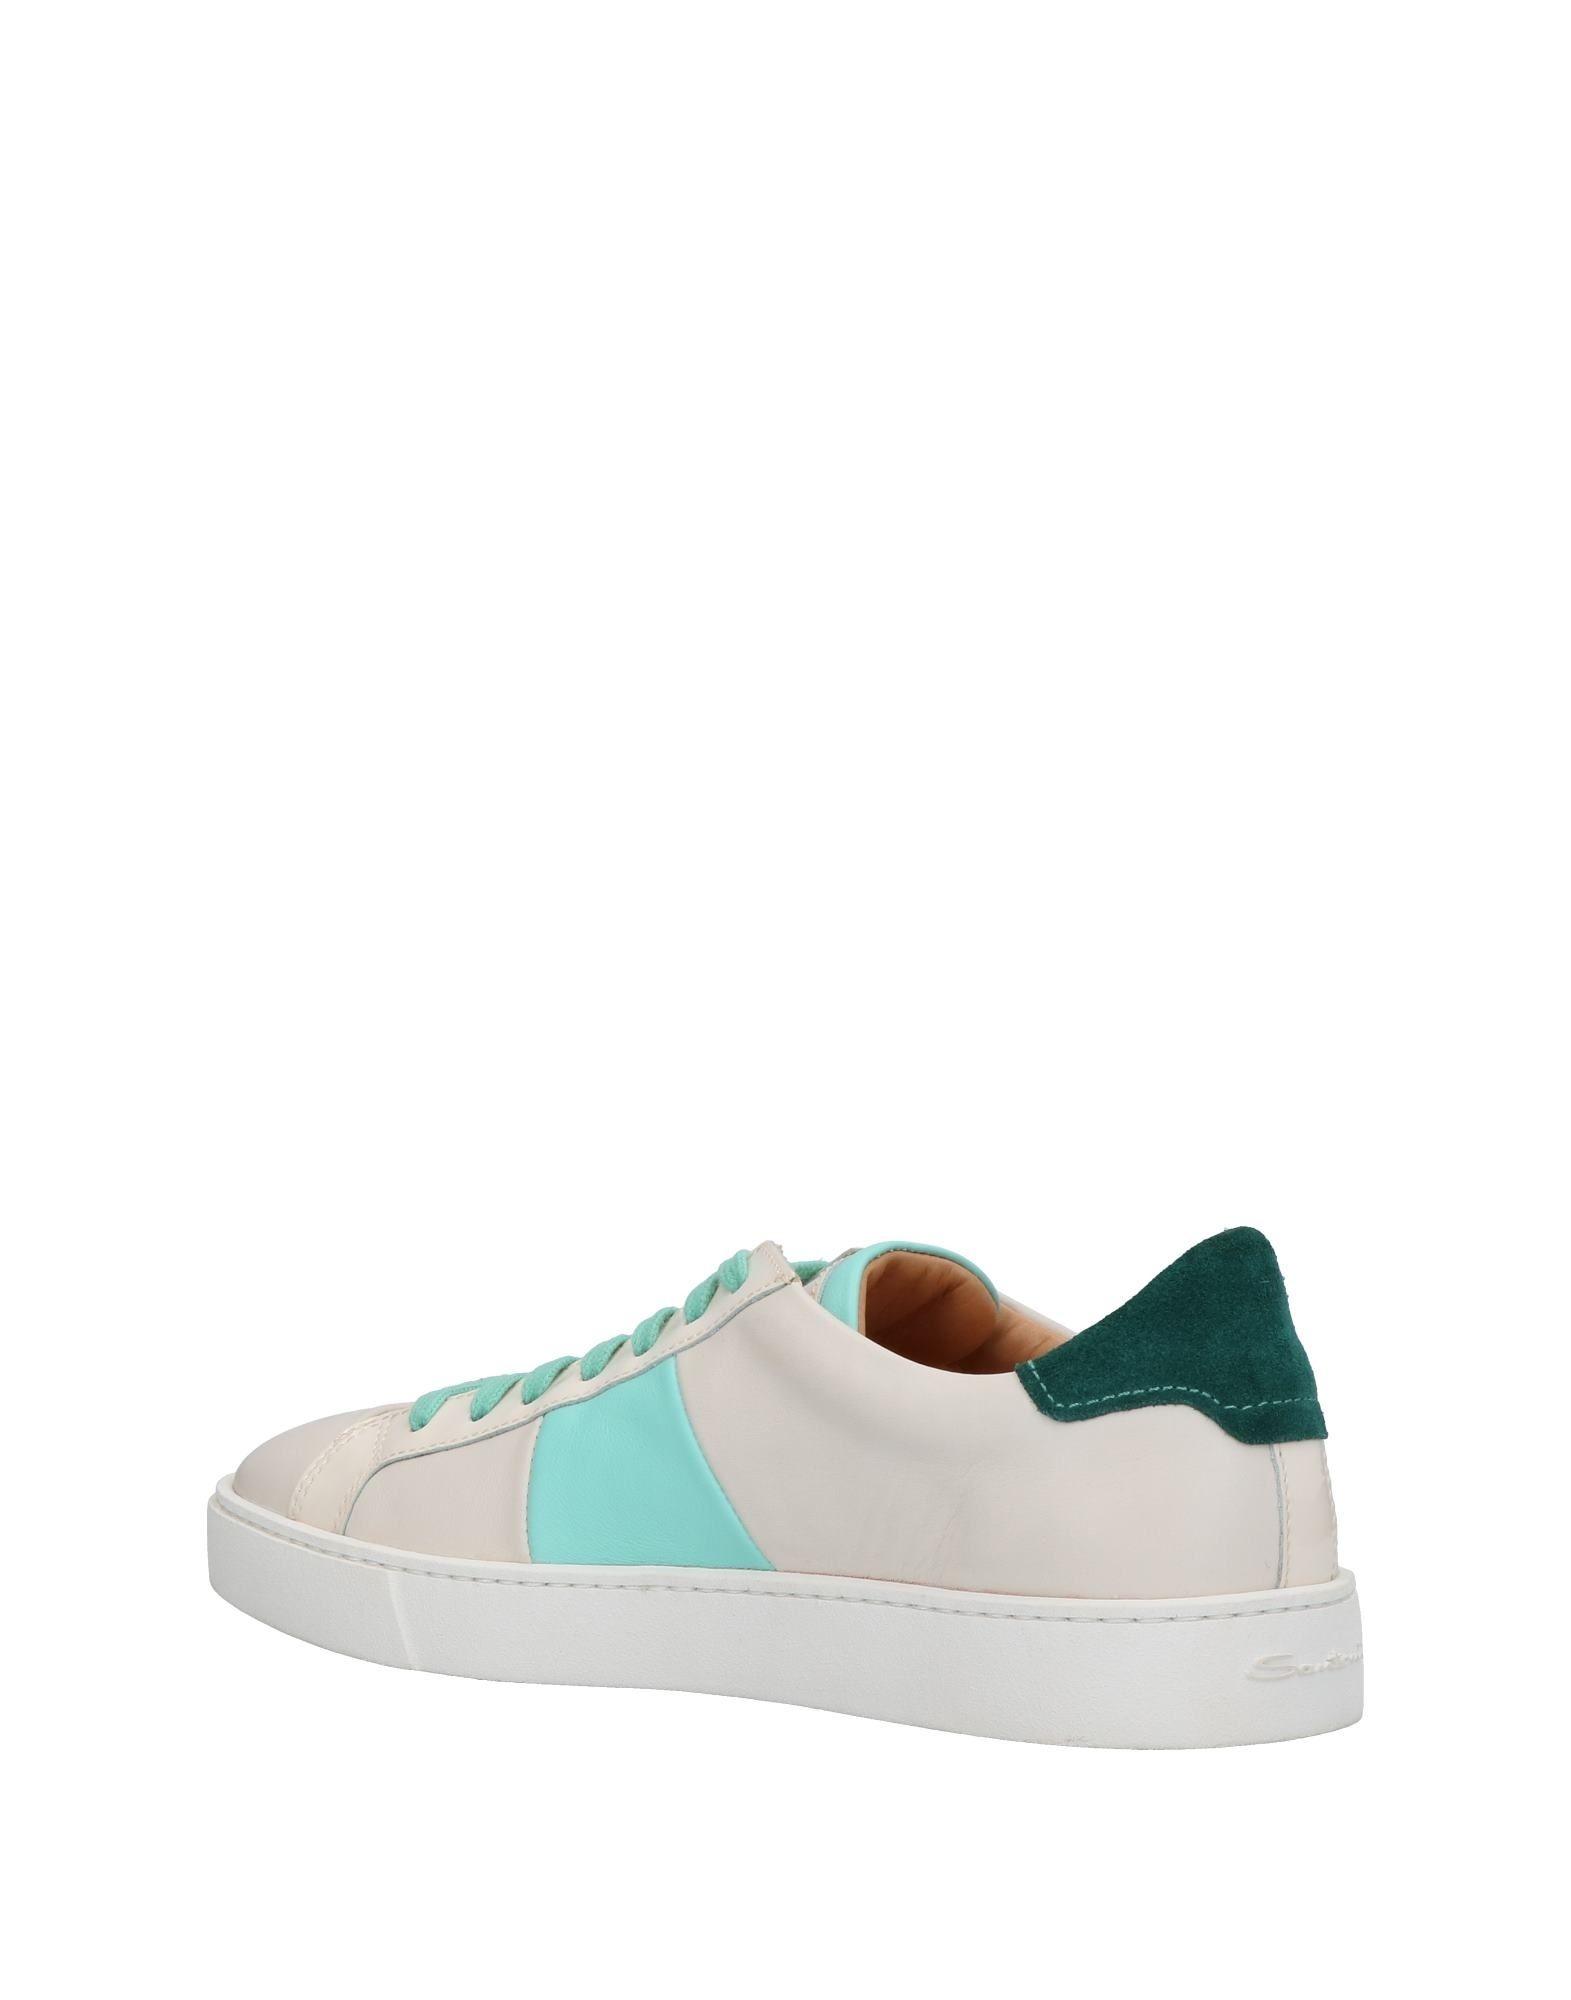 Sneakers Santoni Femme - Sneakers Santoni sur